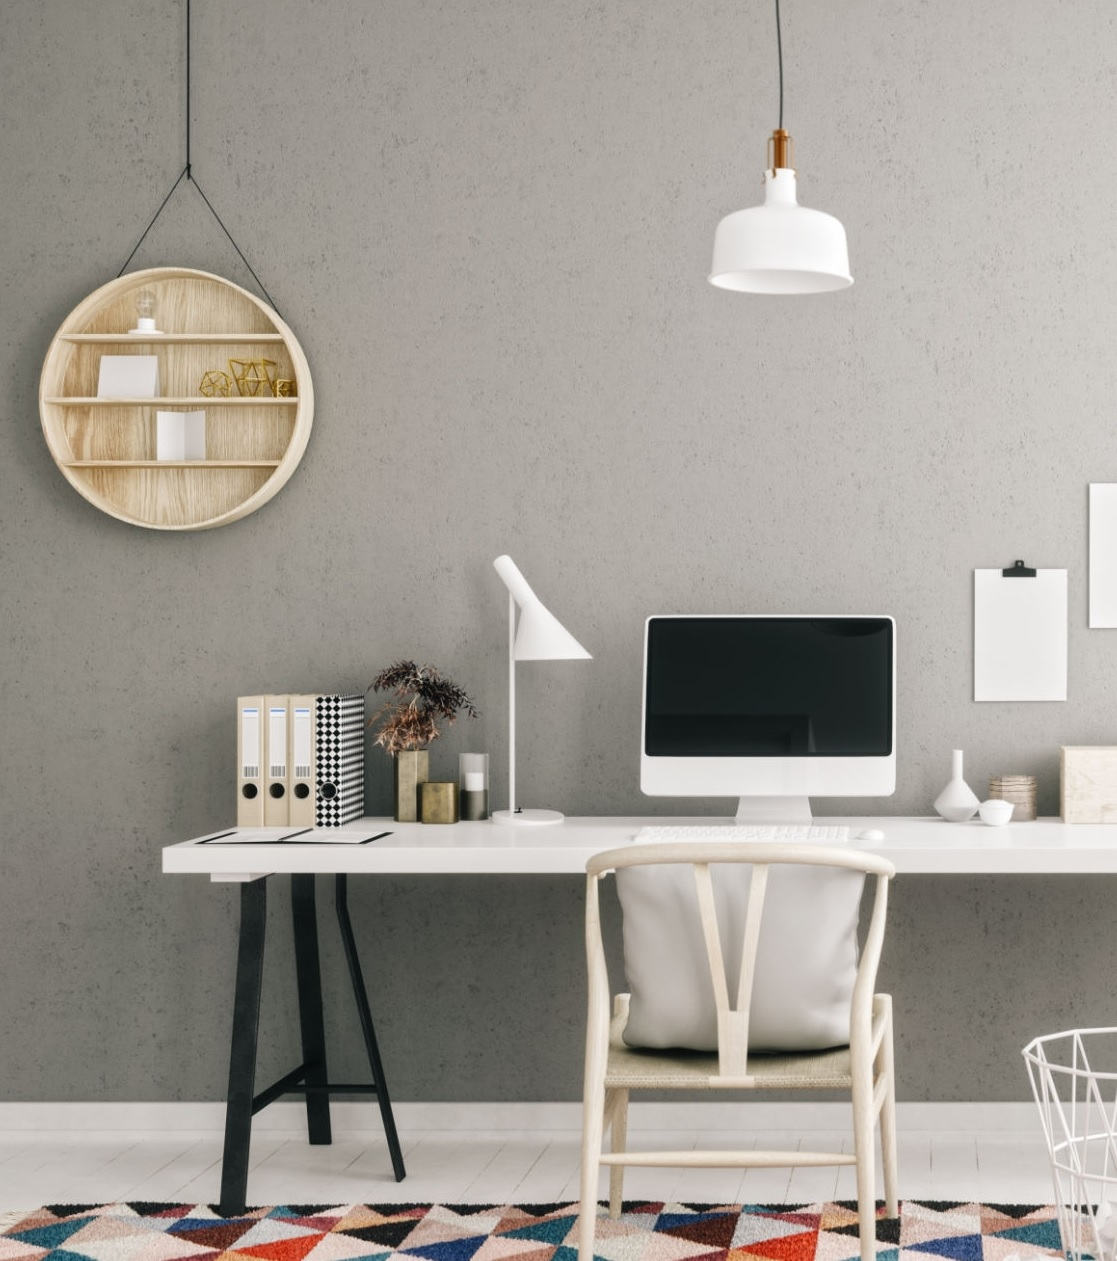 Personal Desk Space